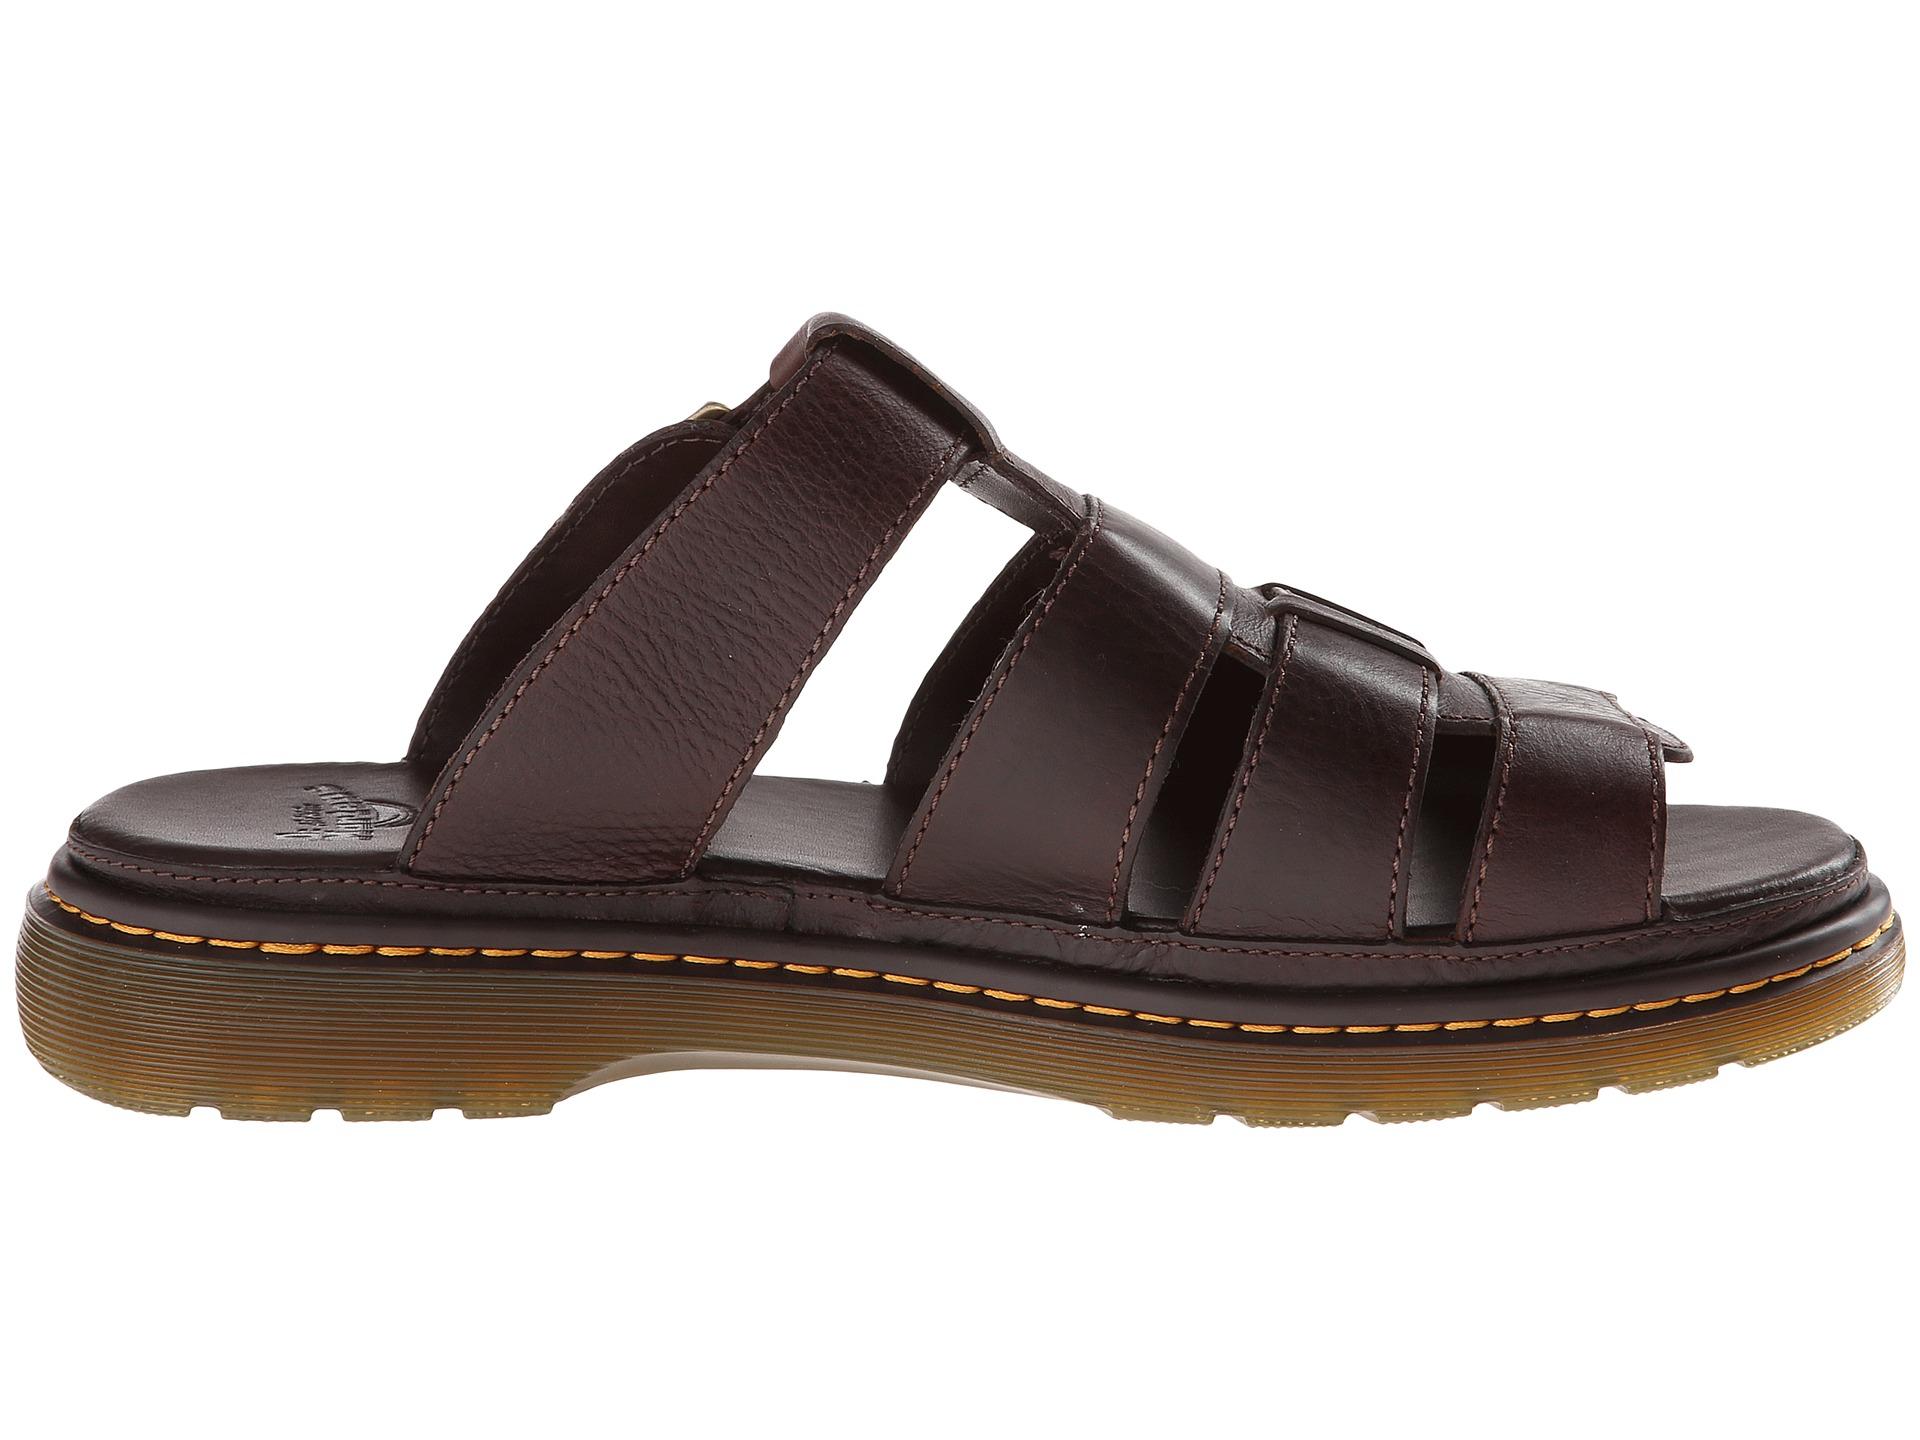 Dr Martens Mens Revive Dieter Fashion Sandals